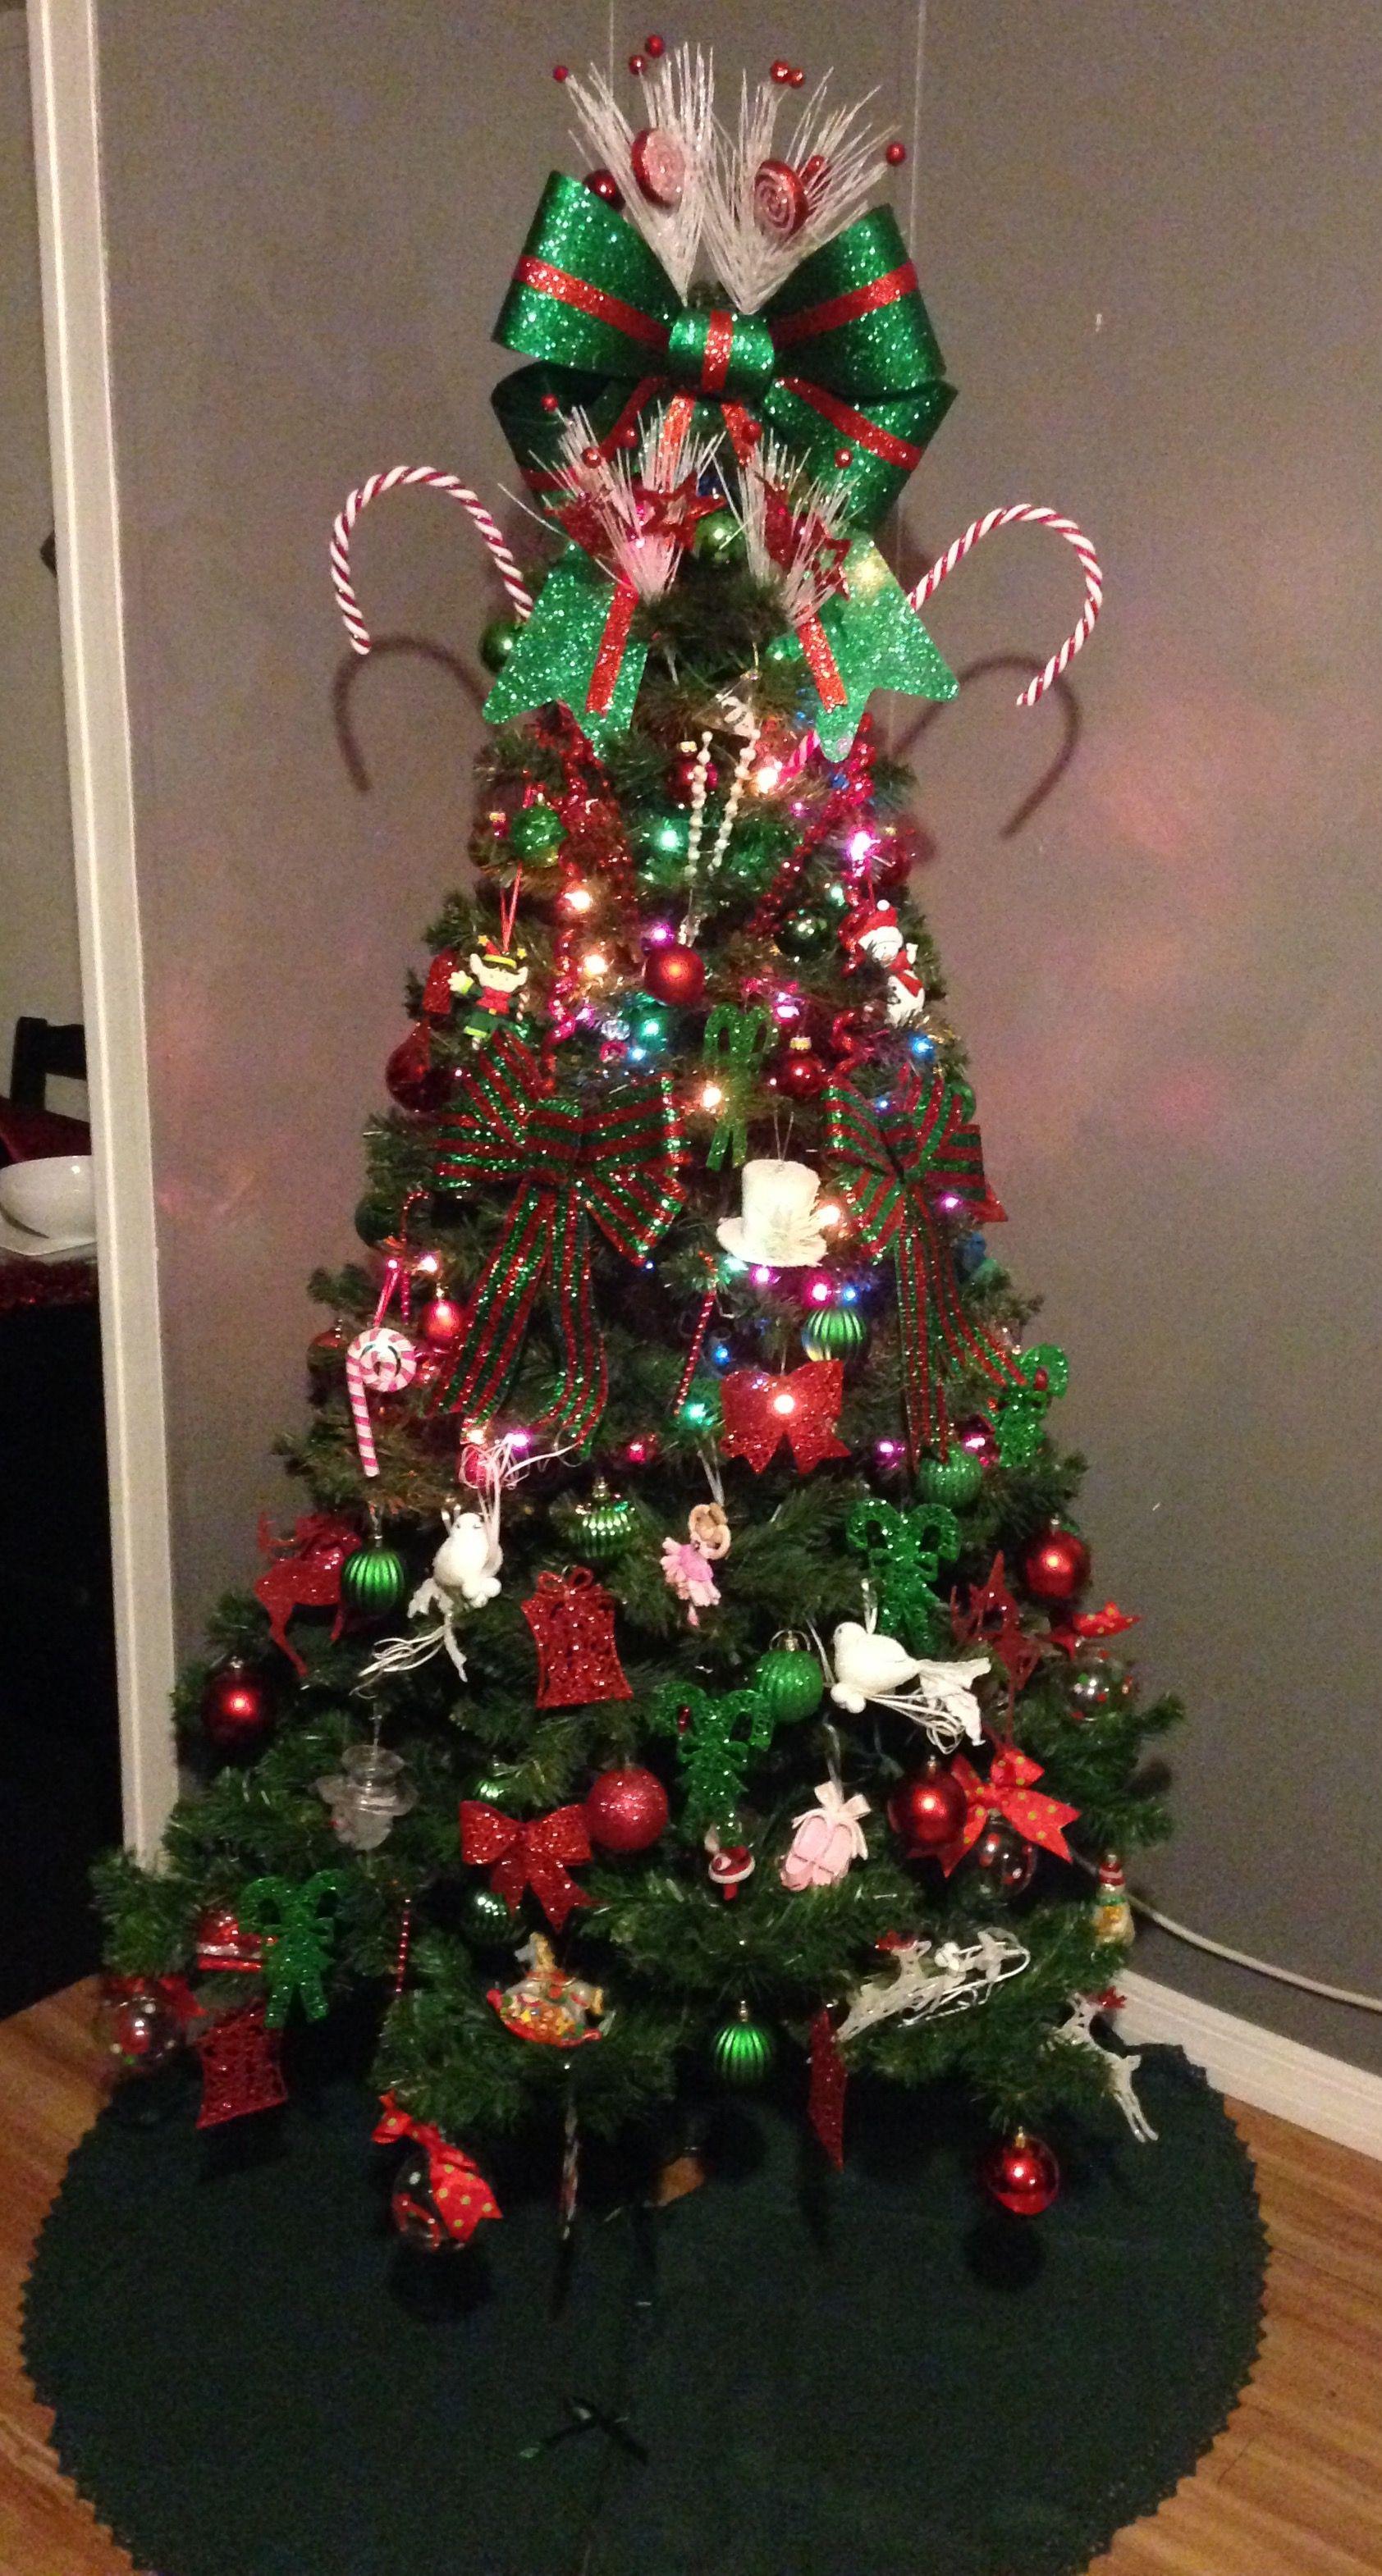 My Beautiful Tree!